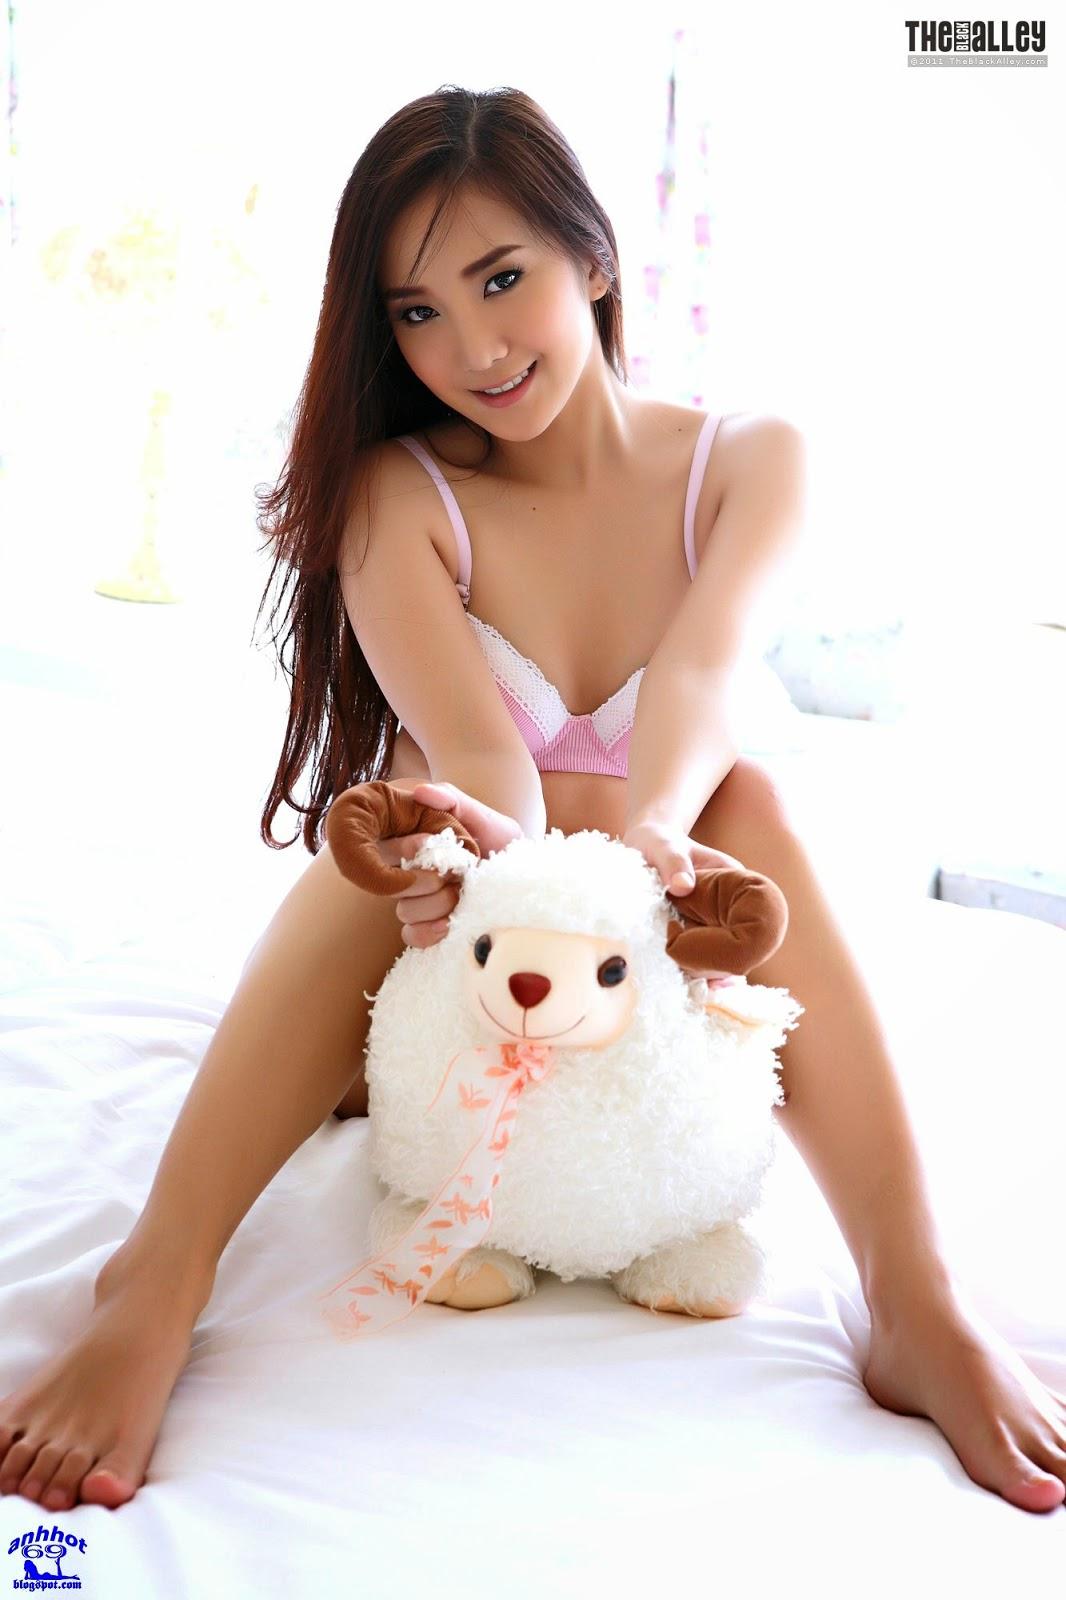 lolita-cheng-64-024